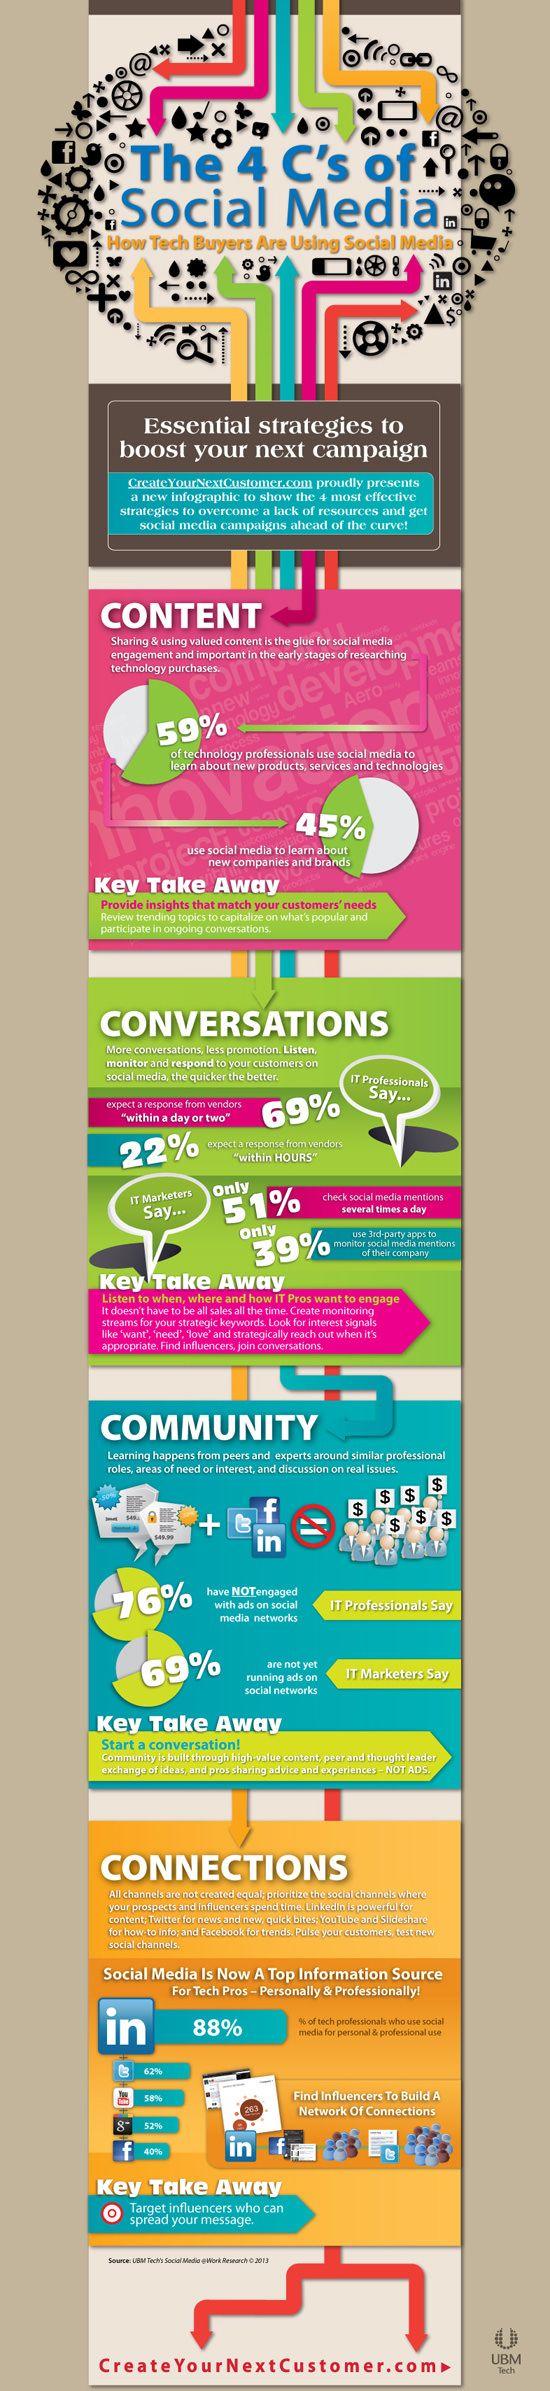 Cheatsheets & Infographics For Social Media Marketers.